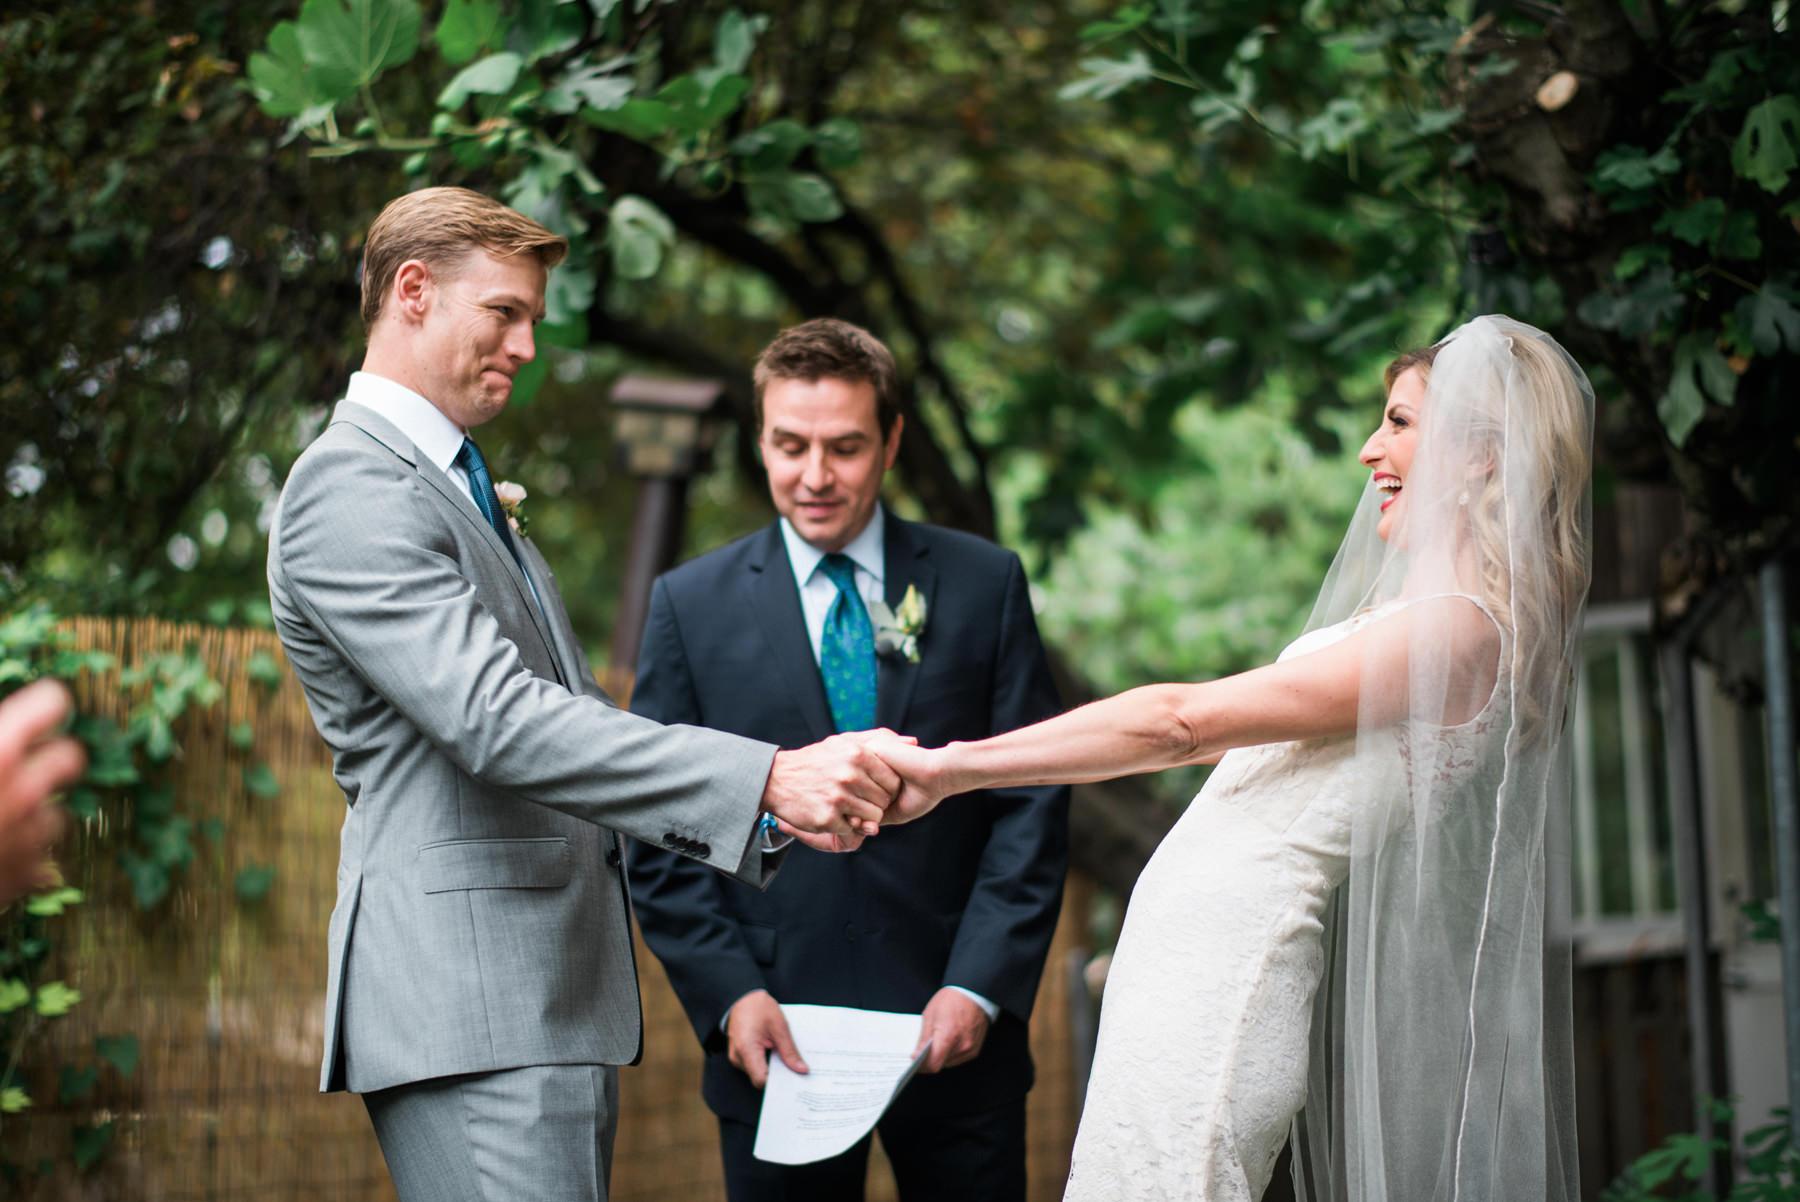 215-outdoor-wedding-ceremony-at-the-corson-building.jpg